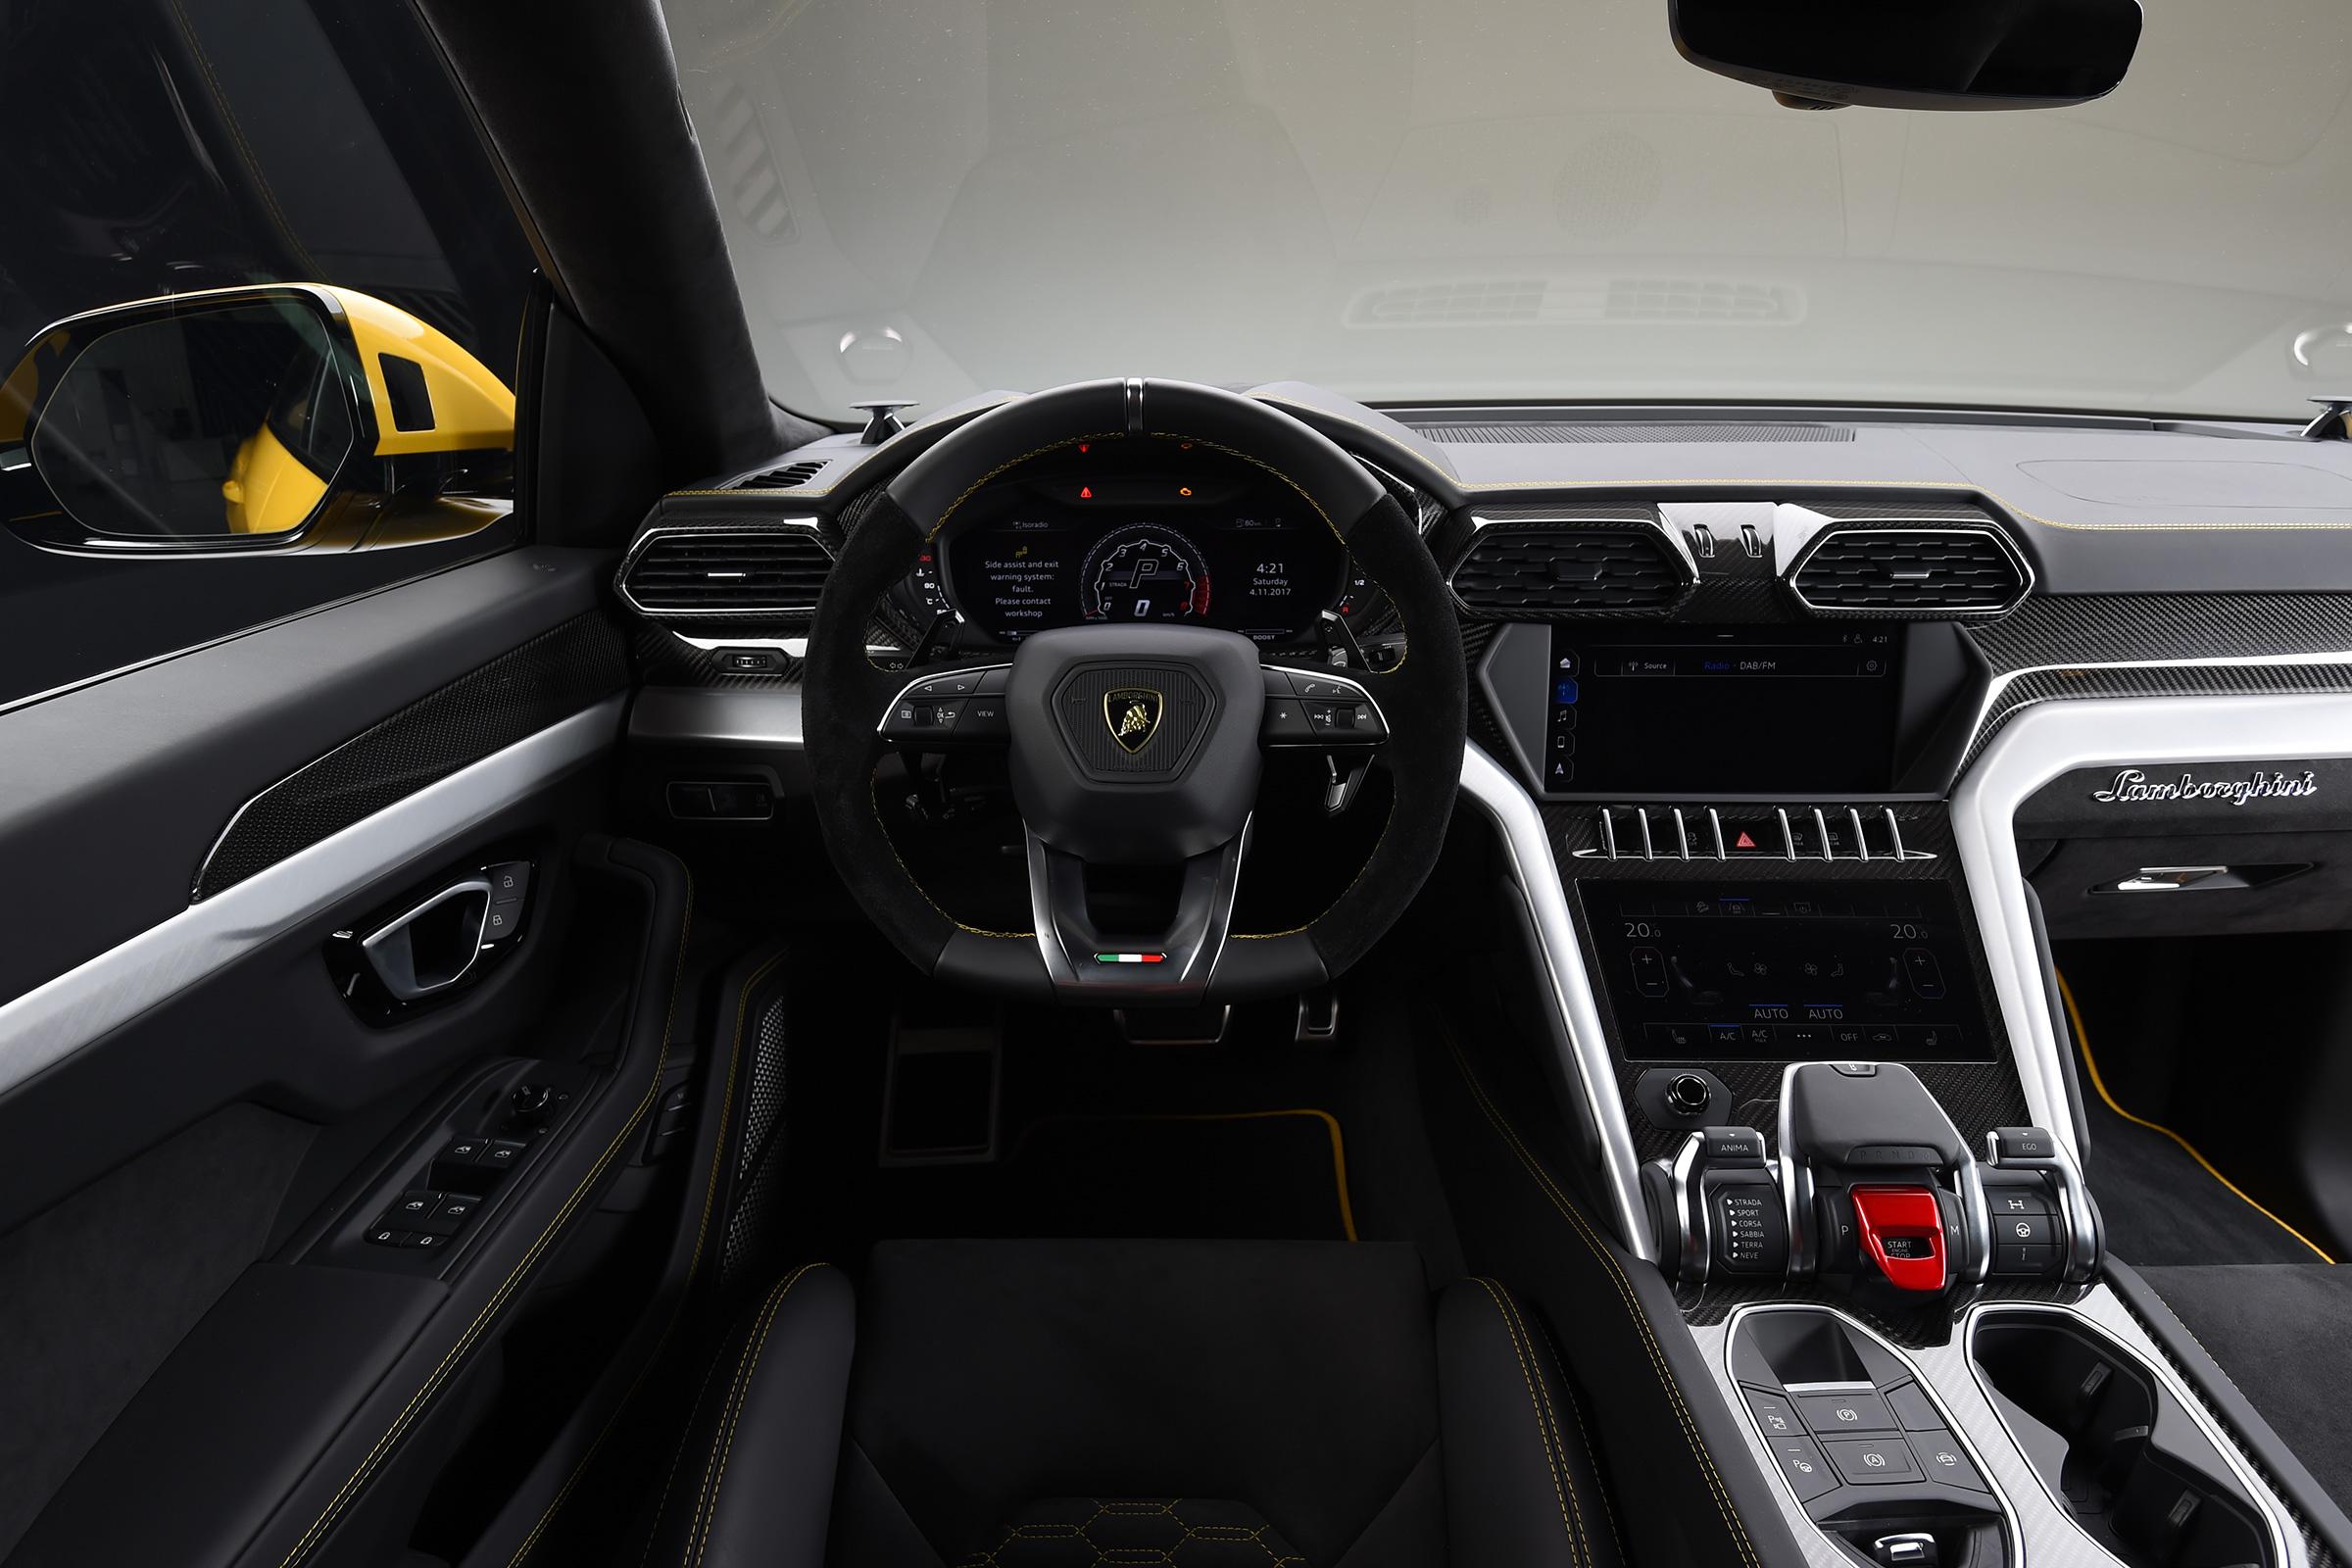 New Lamborghini Urus SUV revealed in full – due in 2018 | Evo